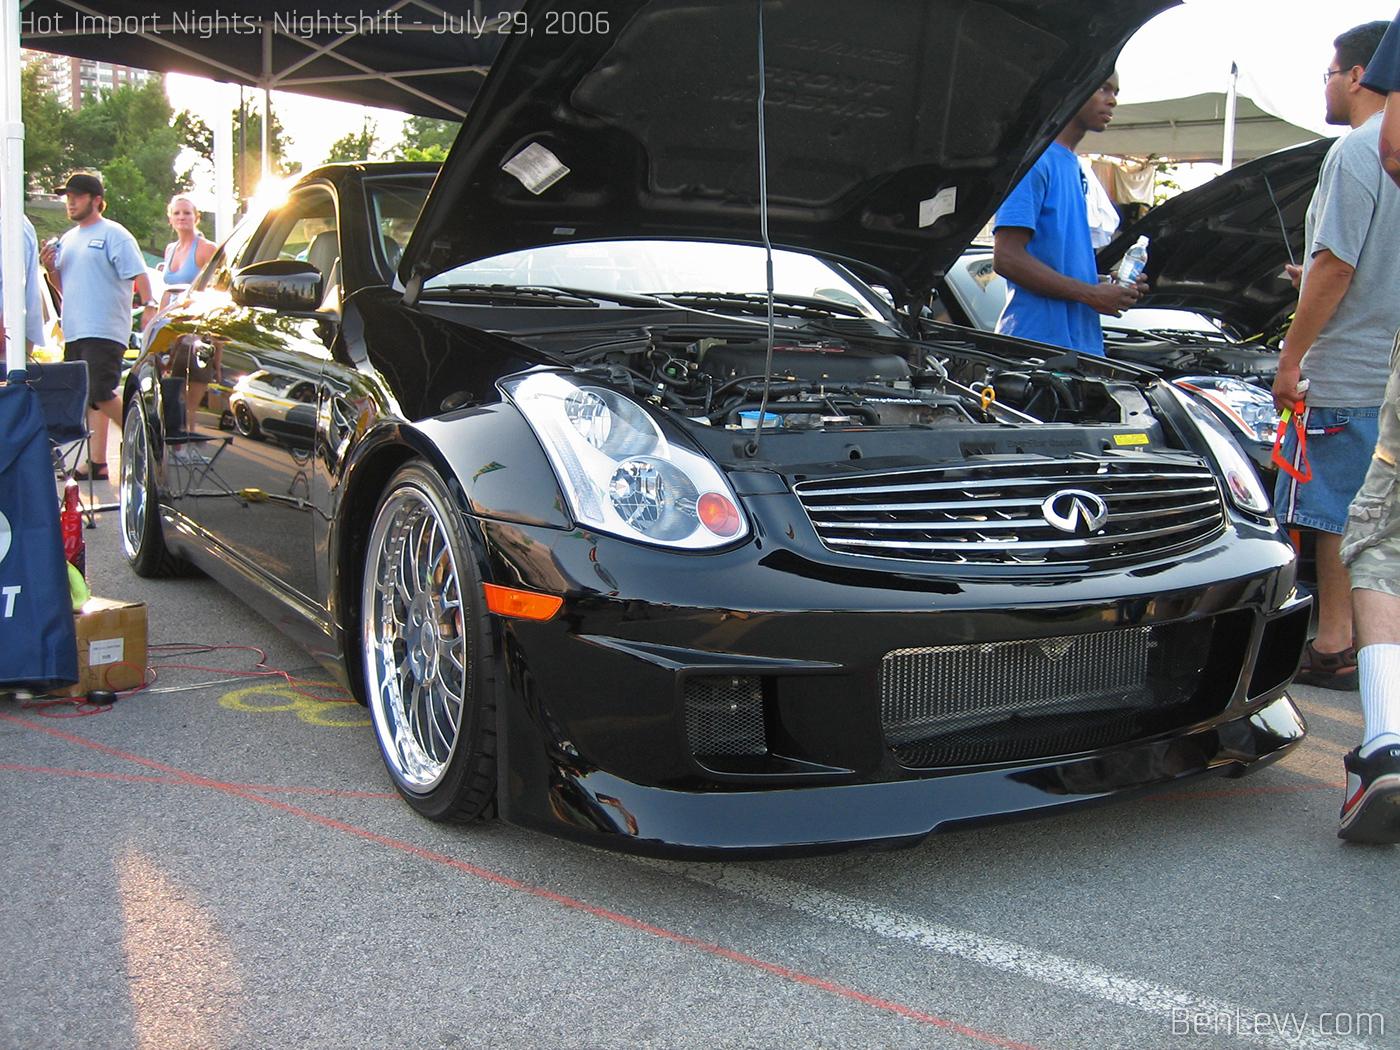 Black Infiniti G35 Coupe  BenLevycom